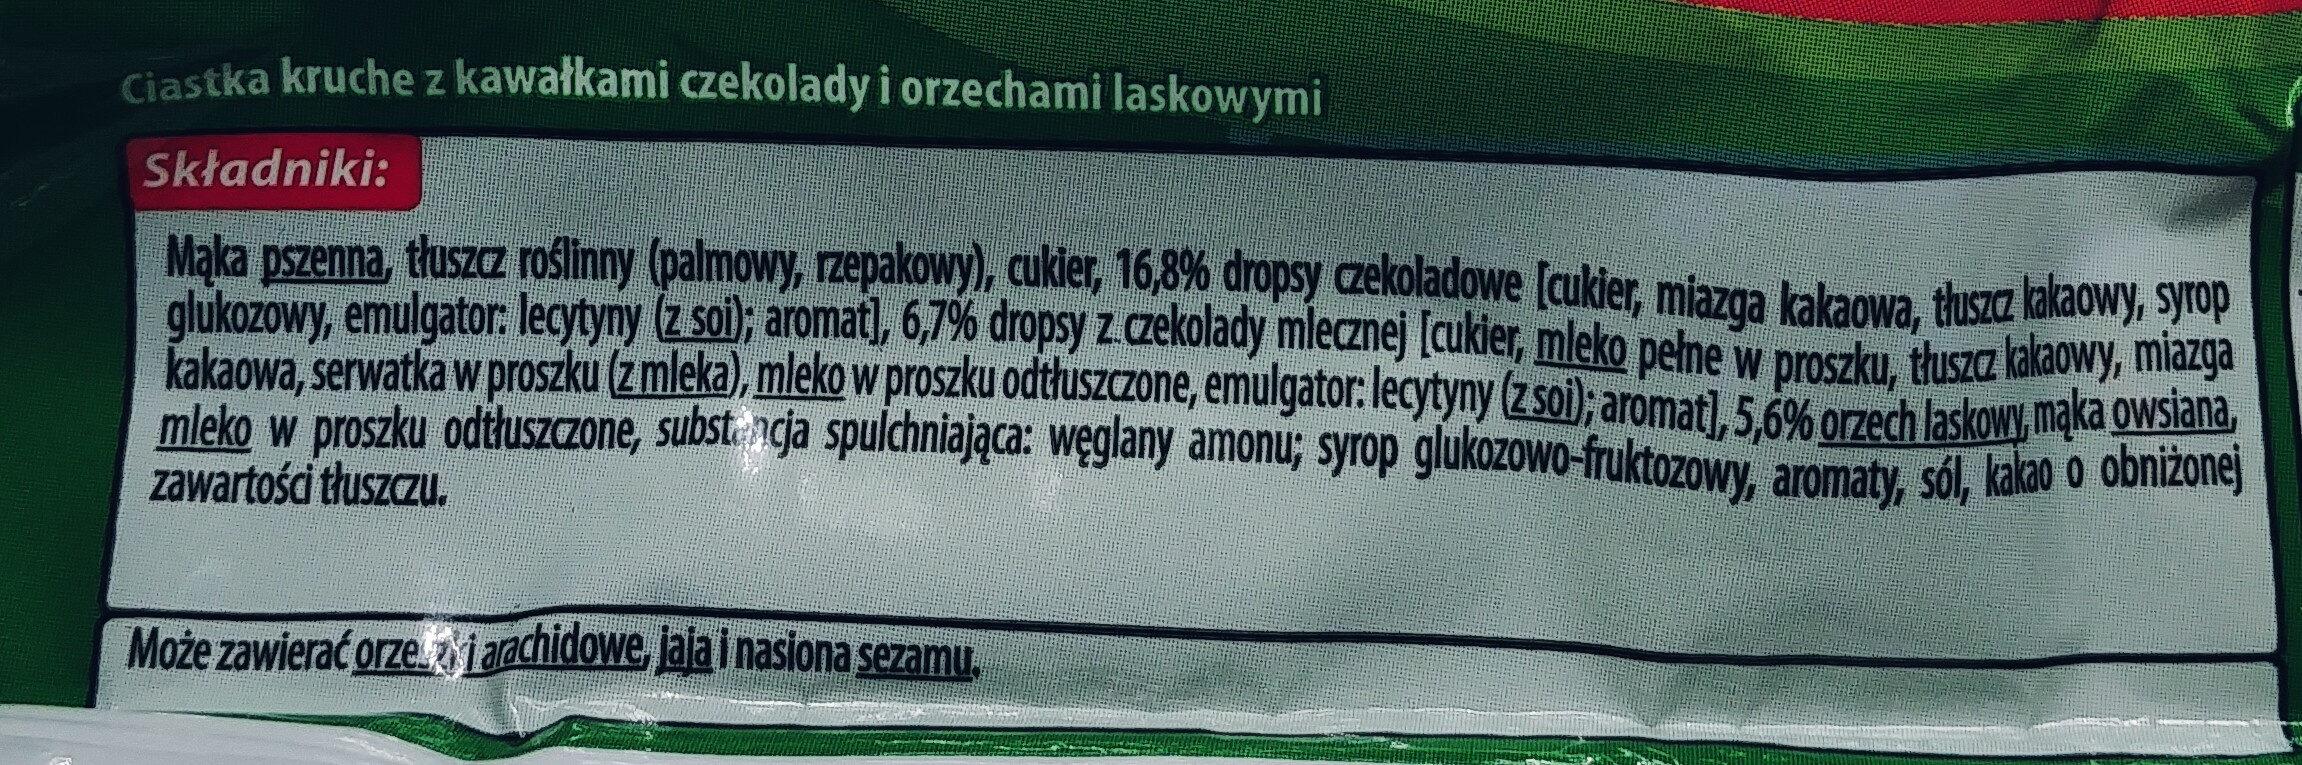 Original Cookies Chocolate Chip With Hazelnut - Składniki - pl